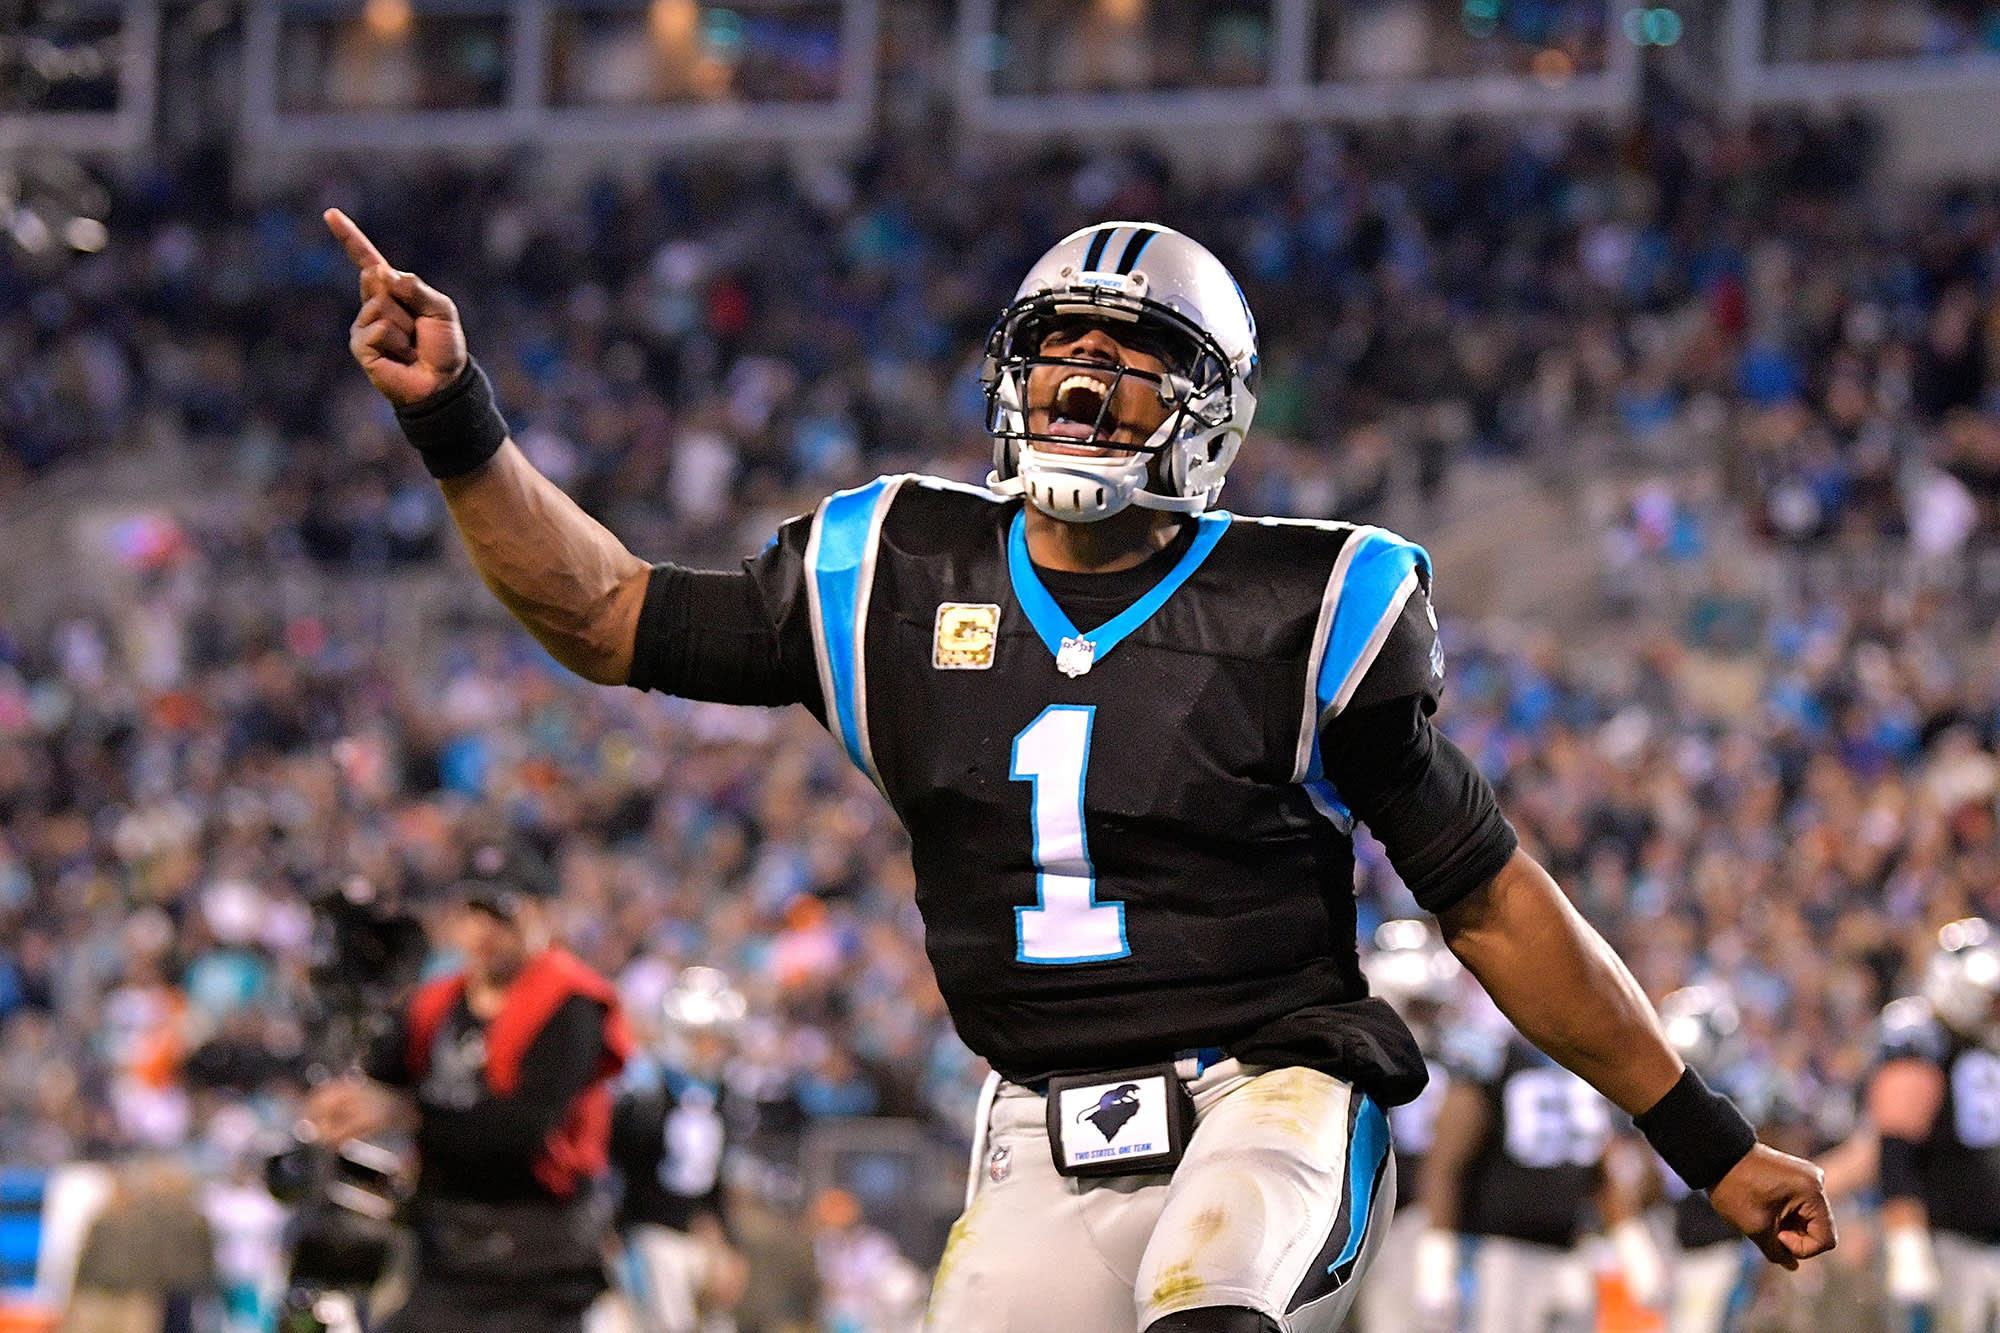 David Tepper close to finalizing record deal for Carolina Panthers